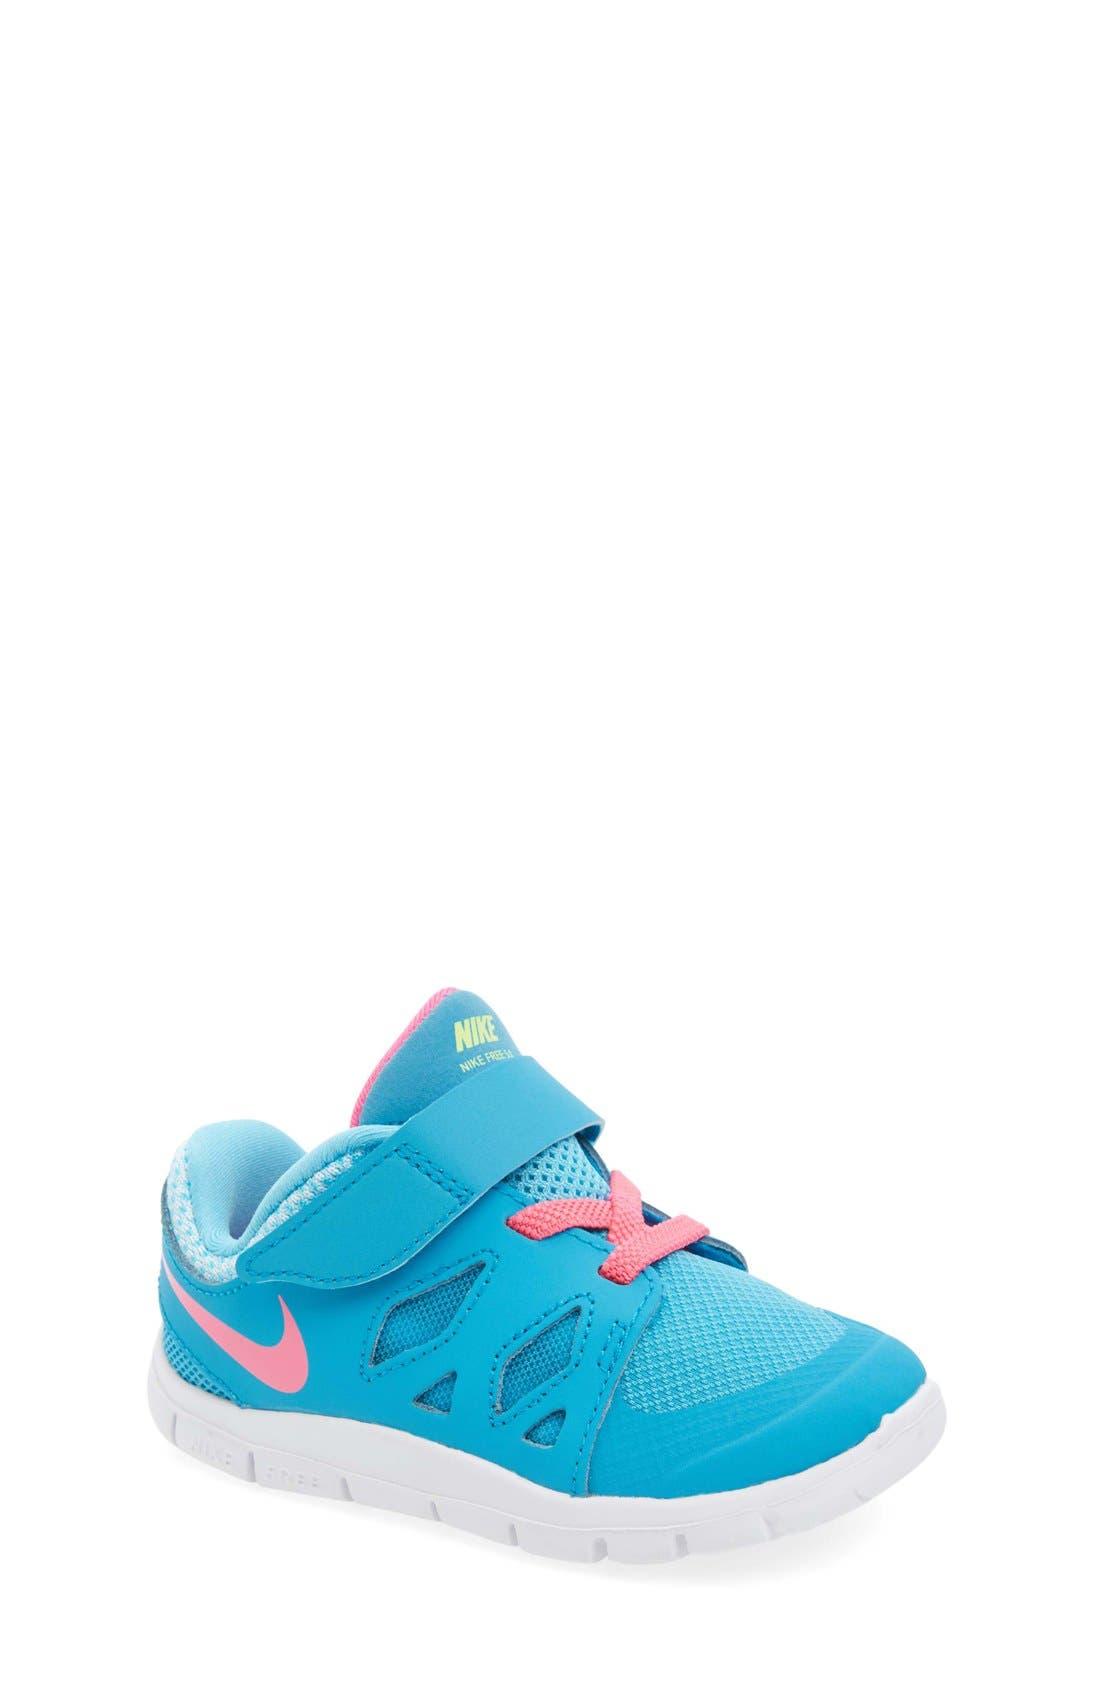 Alternate Image 1 Selected - Nike 'Free 5' Athletic Shoe (Baby, Walker & Toddler)